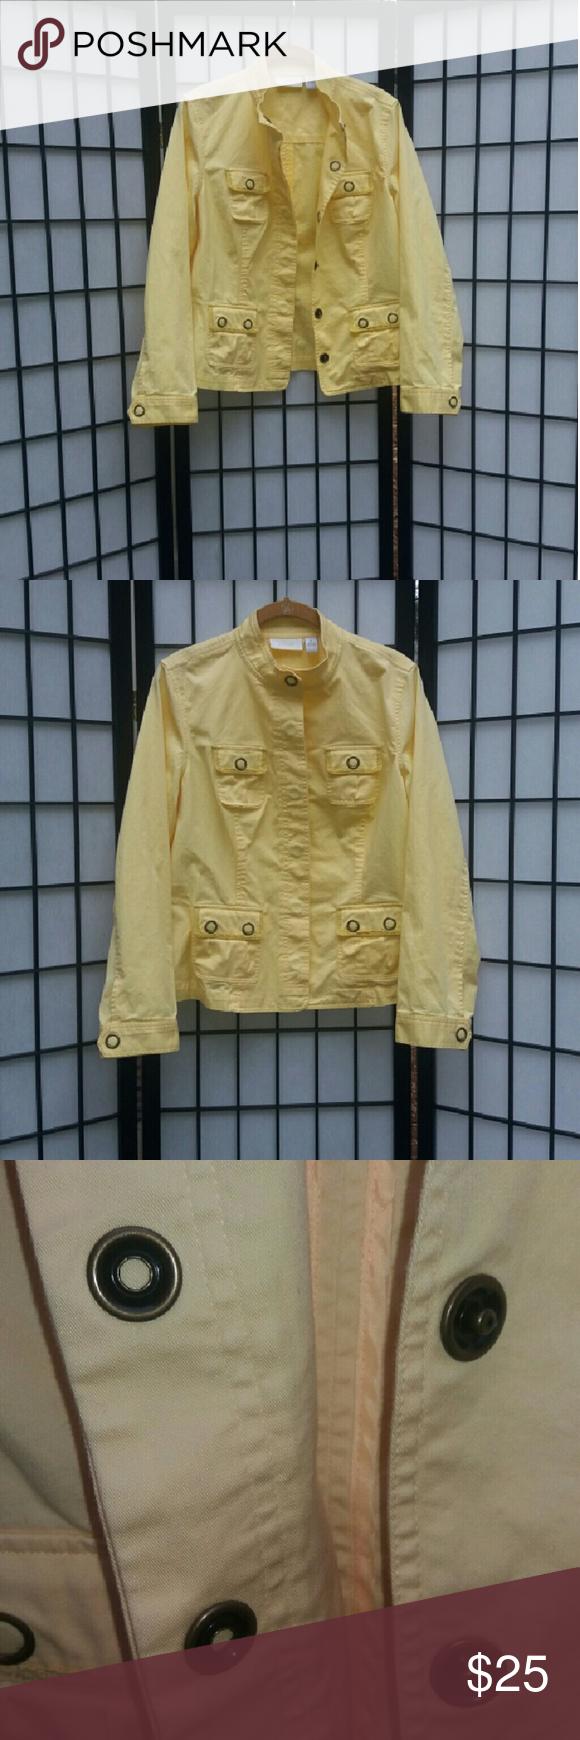 Jacket Chico's yellow lightweight jacket Chico's Jackets & Coats Jean Jackets